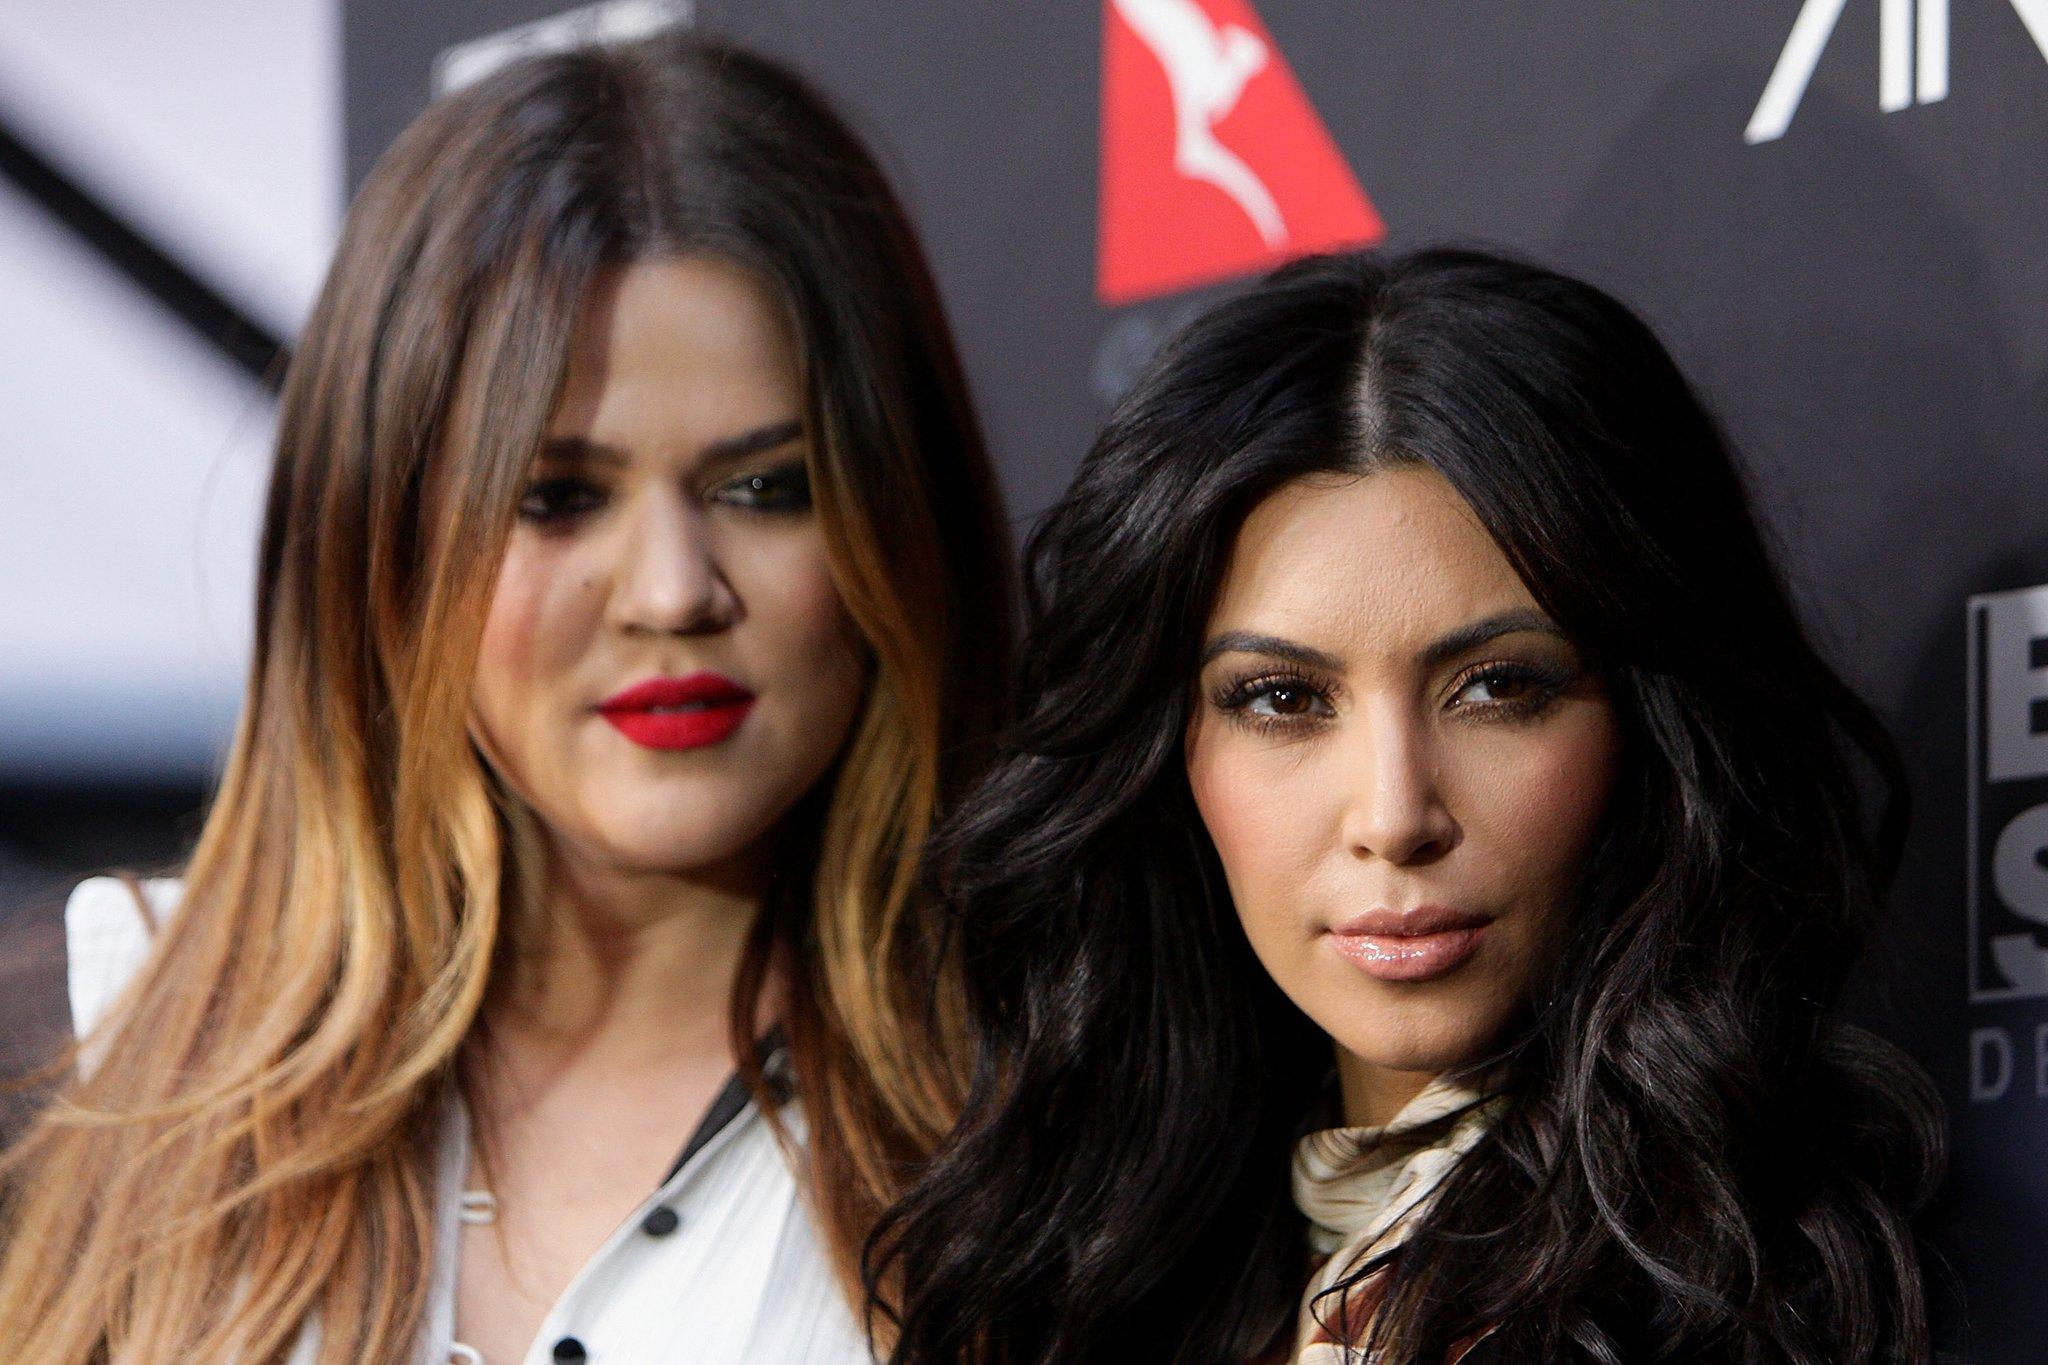 khloe-kardashian-and-kim-kardashian3-1